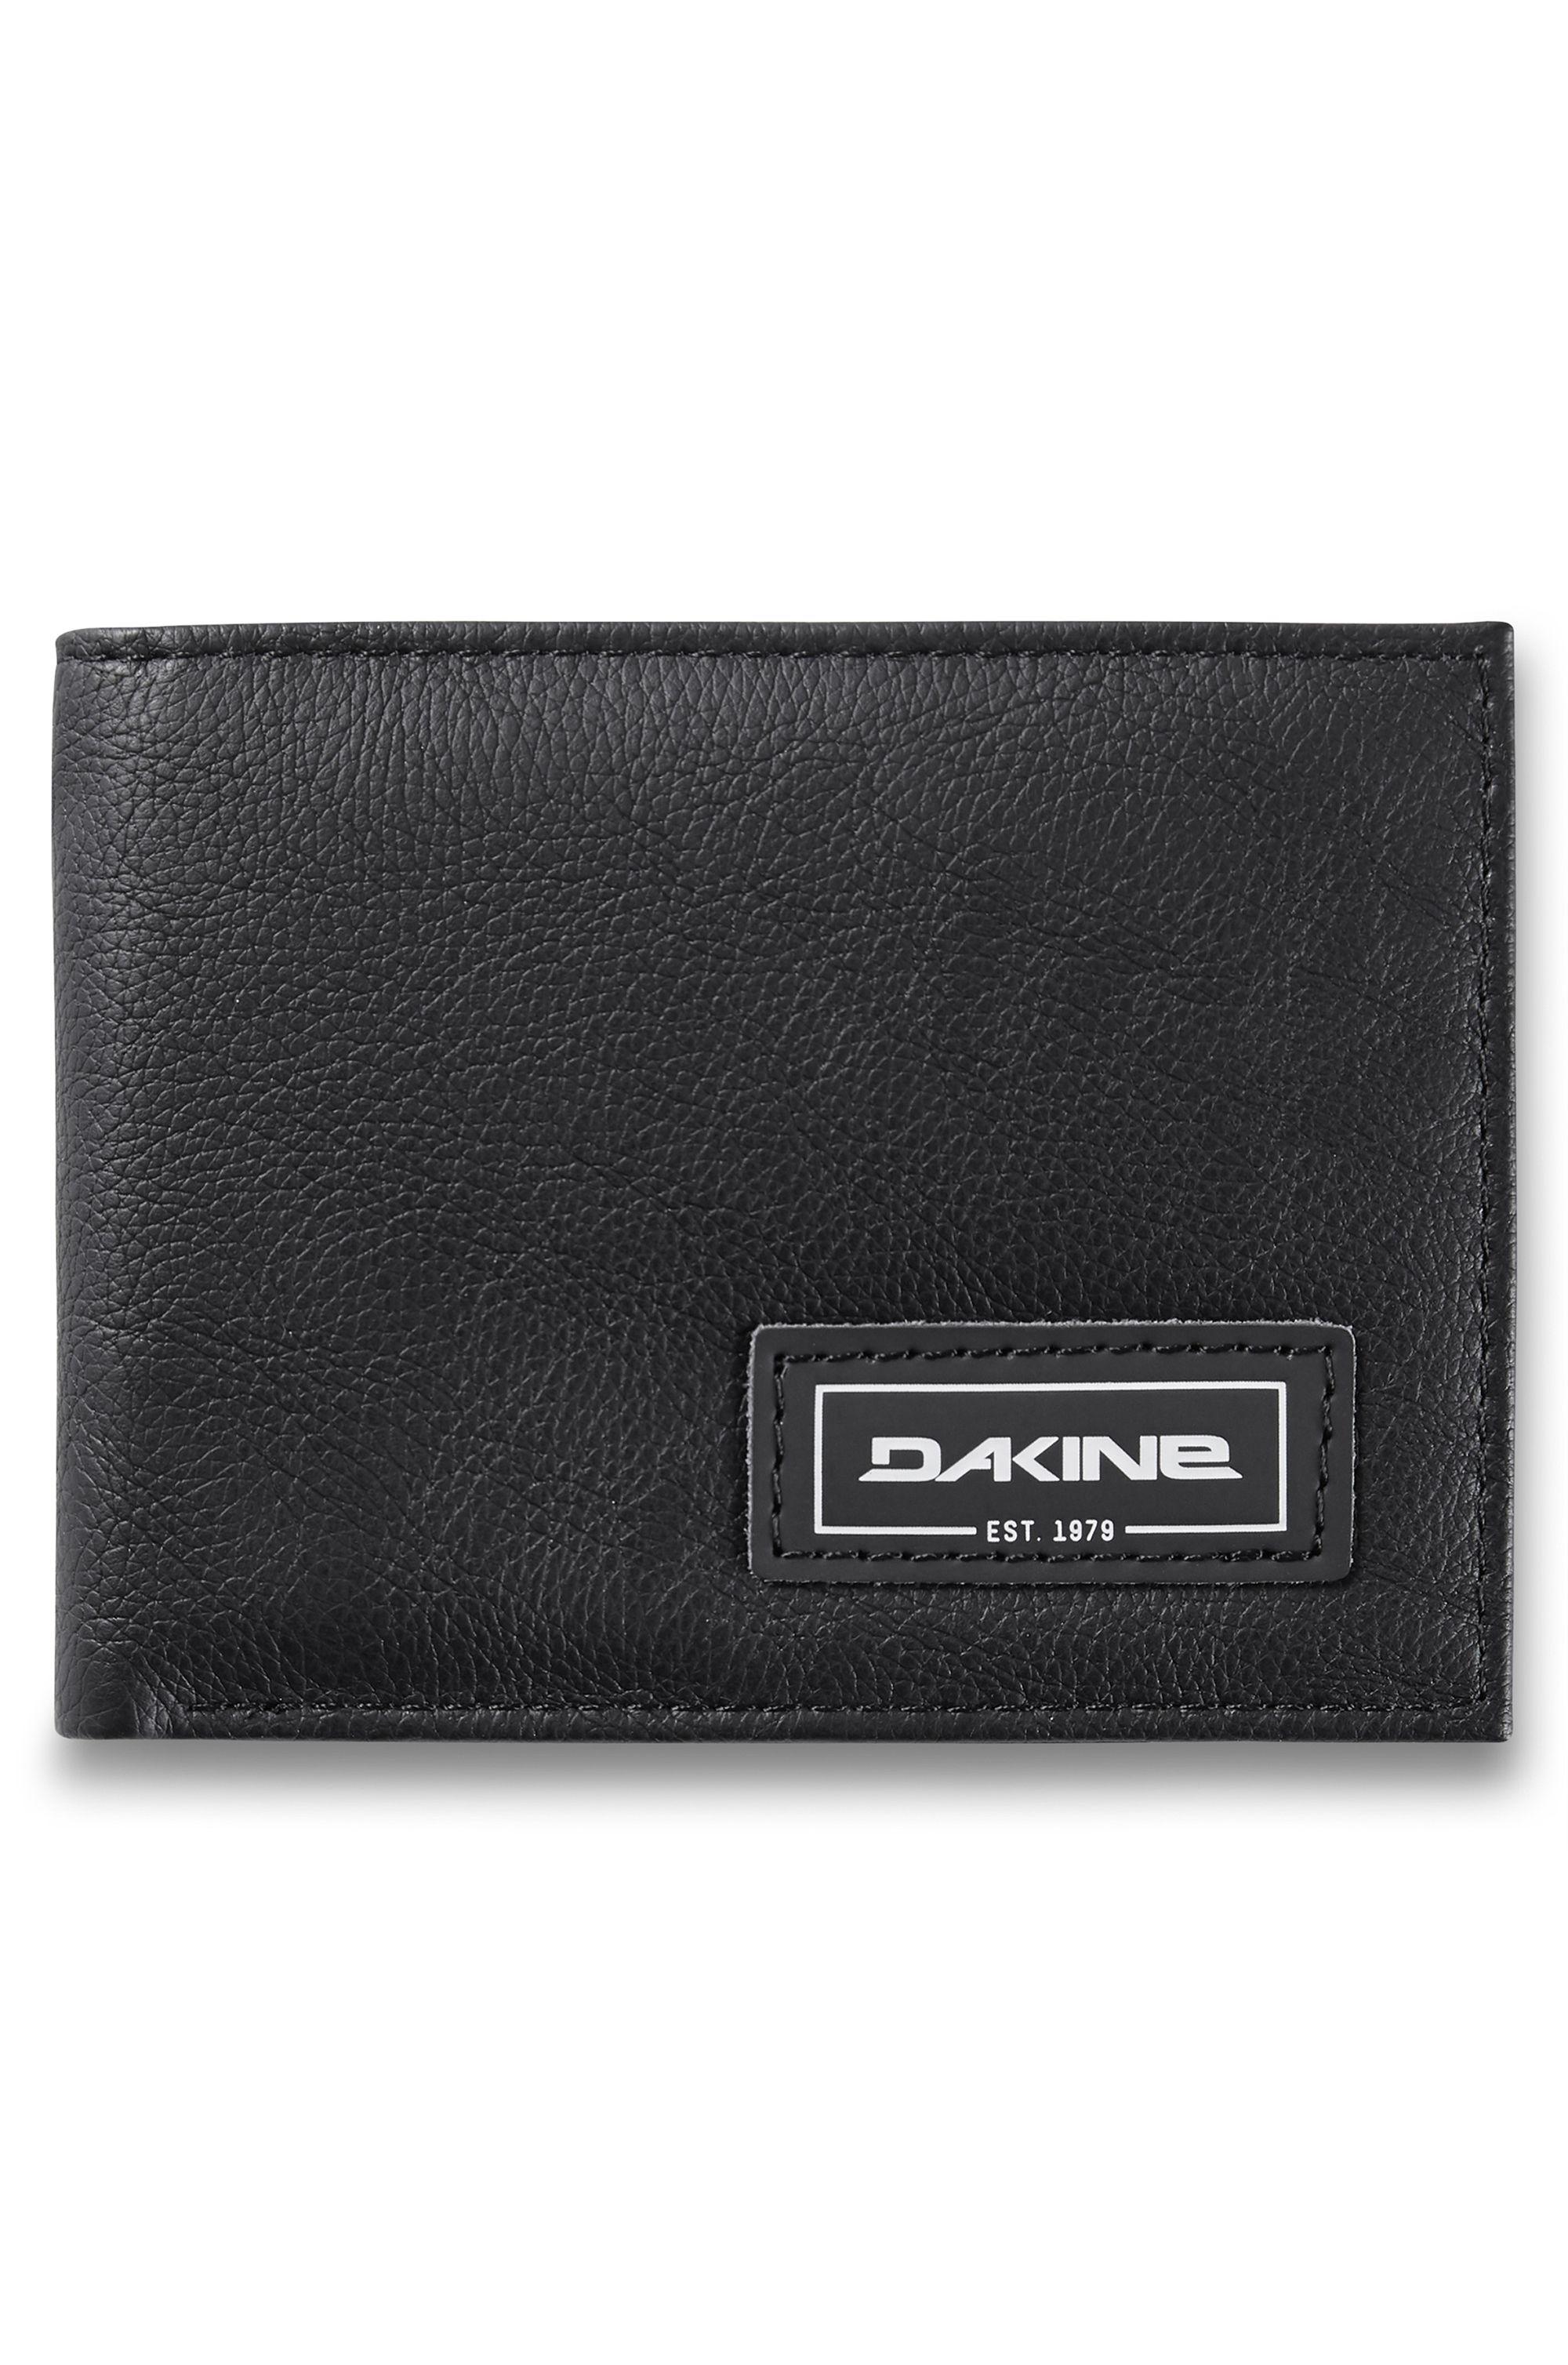 Dakine Wallet RIGGS Black